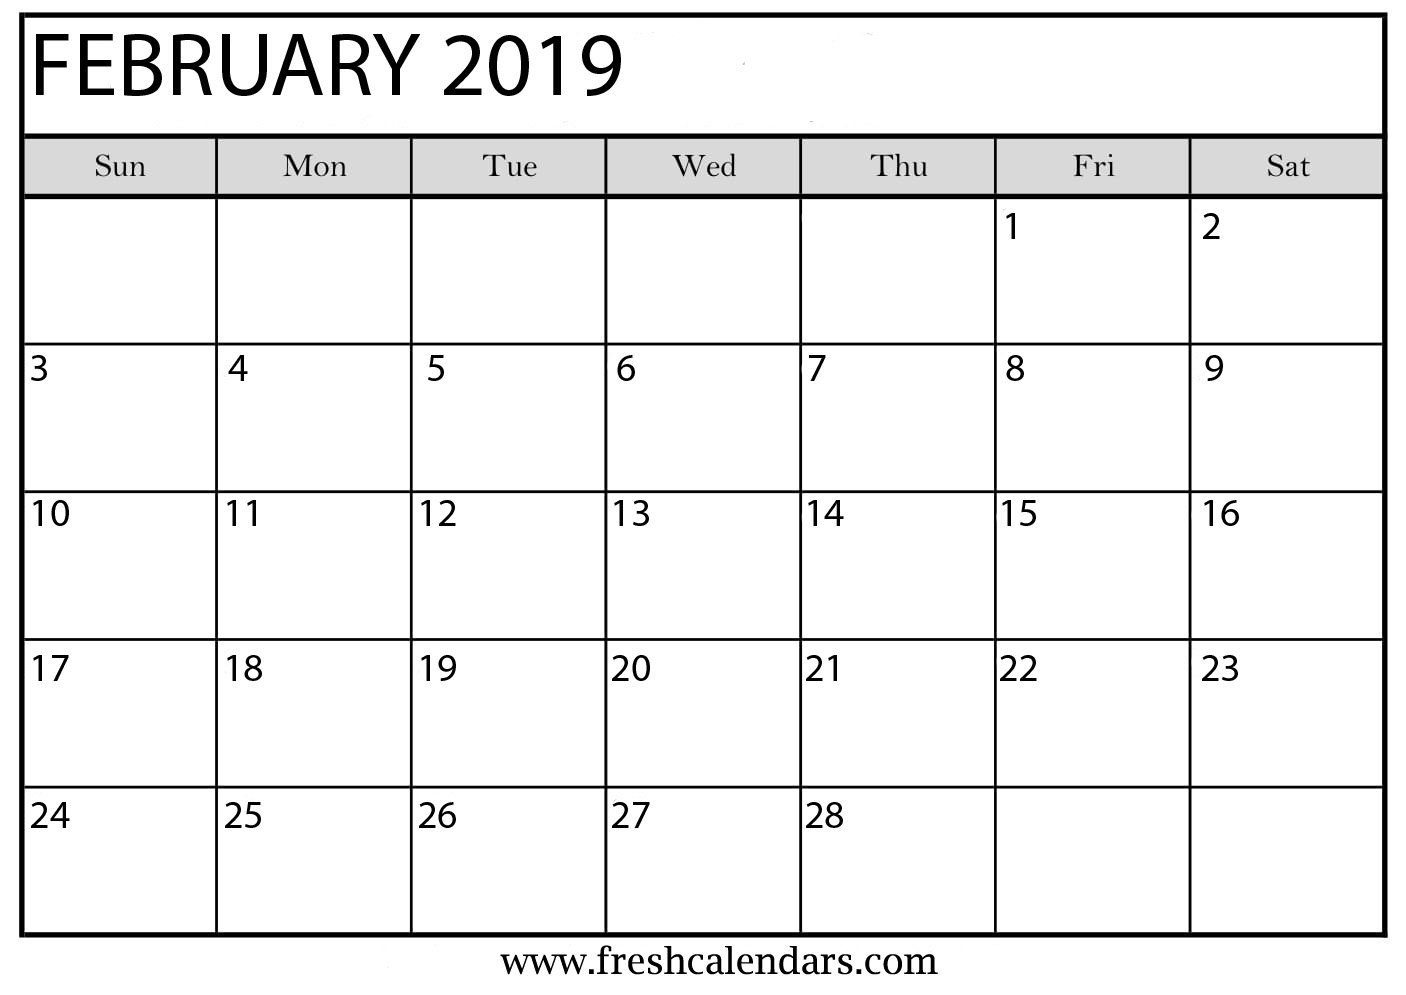 February 2019 Printable Calendars - Fresh Calendars Feb 5 2019 Calendar